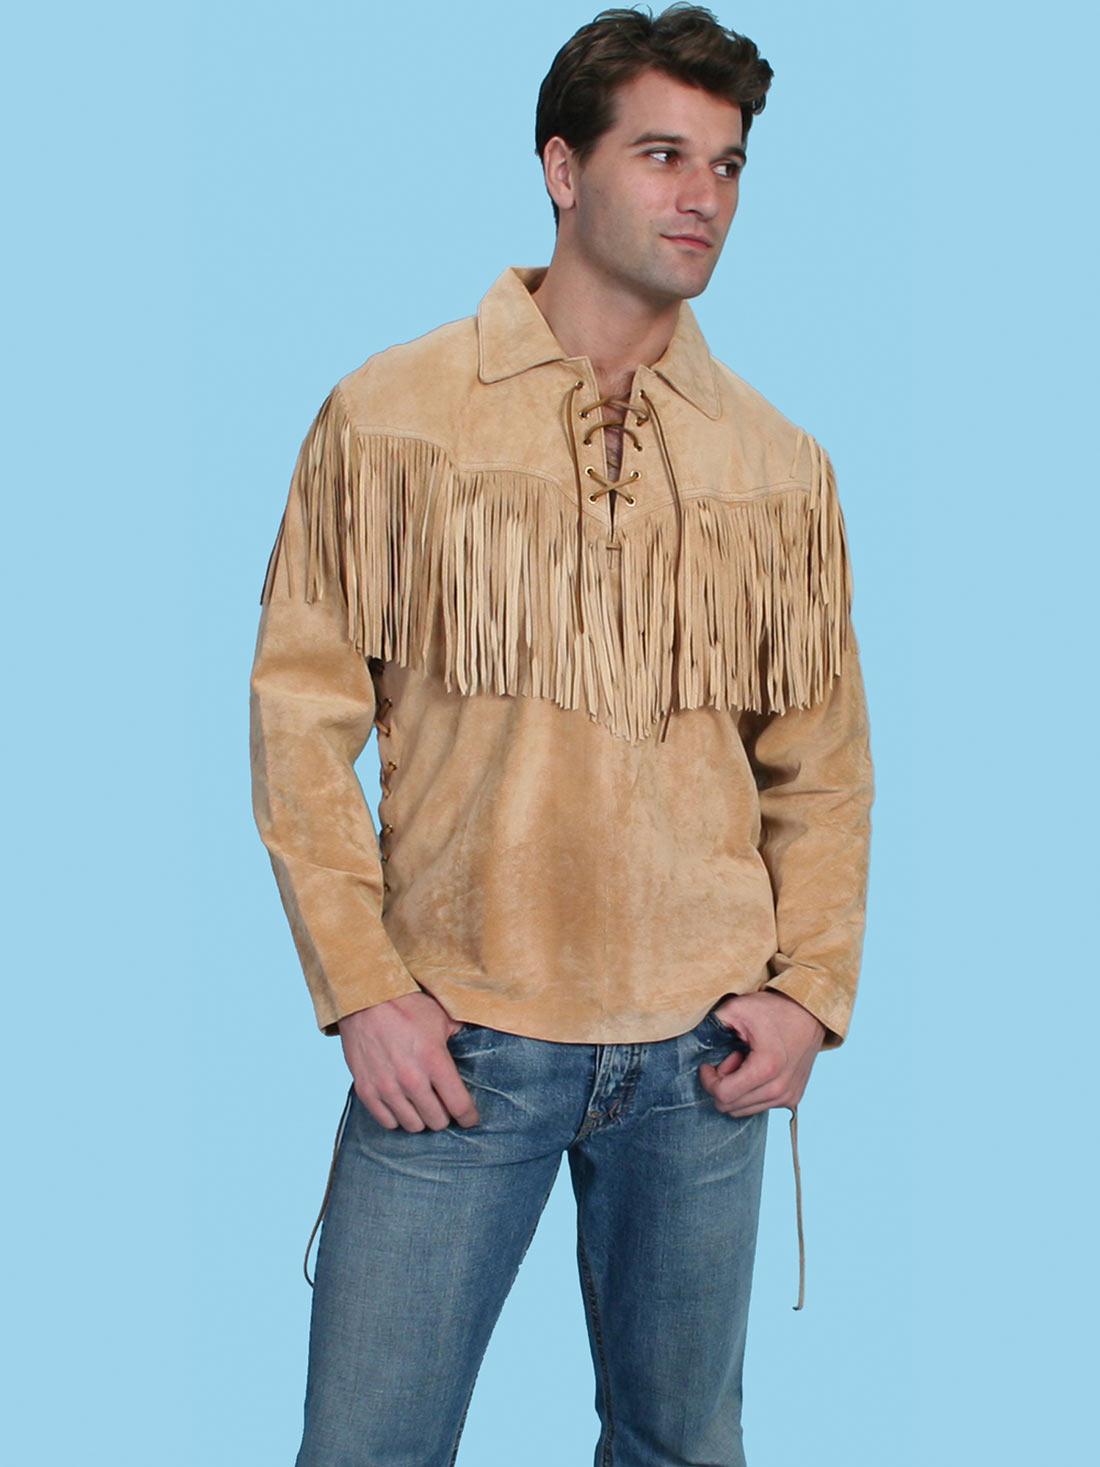 072b5587 Western Shirt With Fringe Mens | RLDM